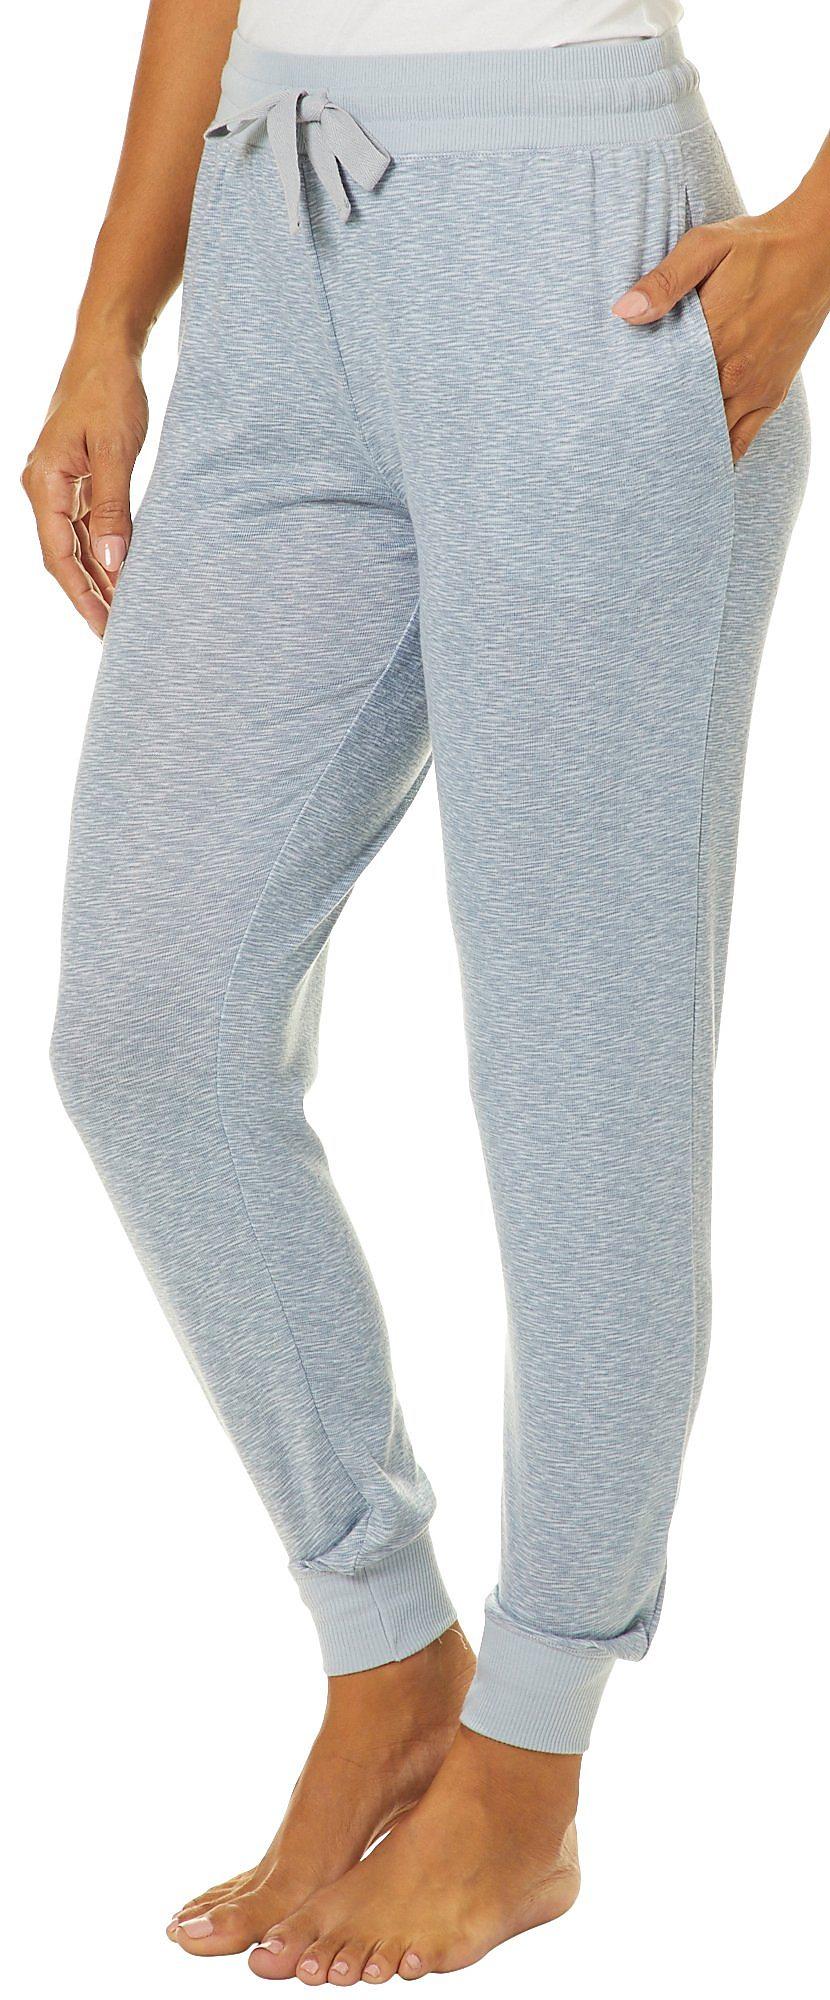 1989a94a9101 Jaclyn Intimates Womens Trade Winds Jogger Pajama Pants | eBay